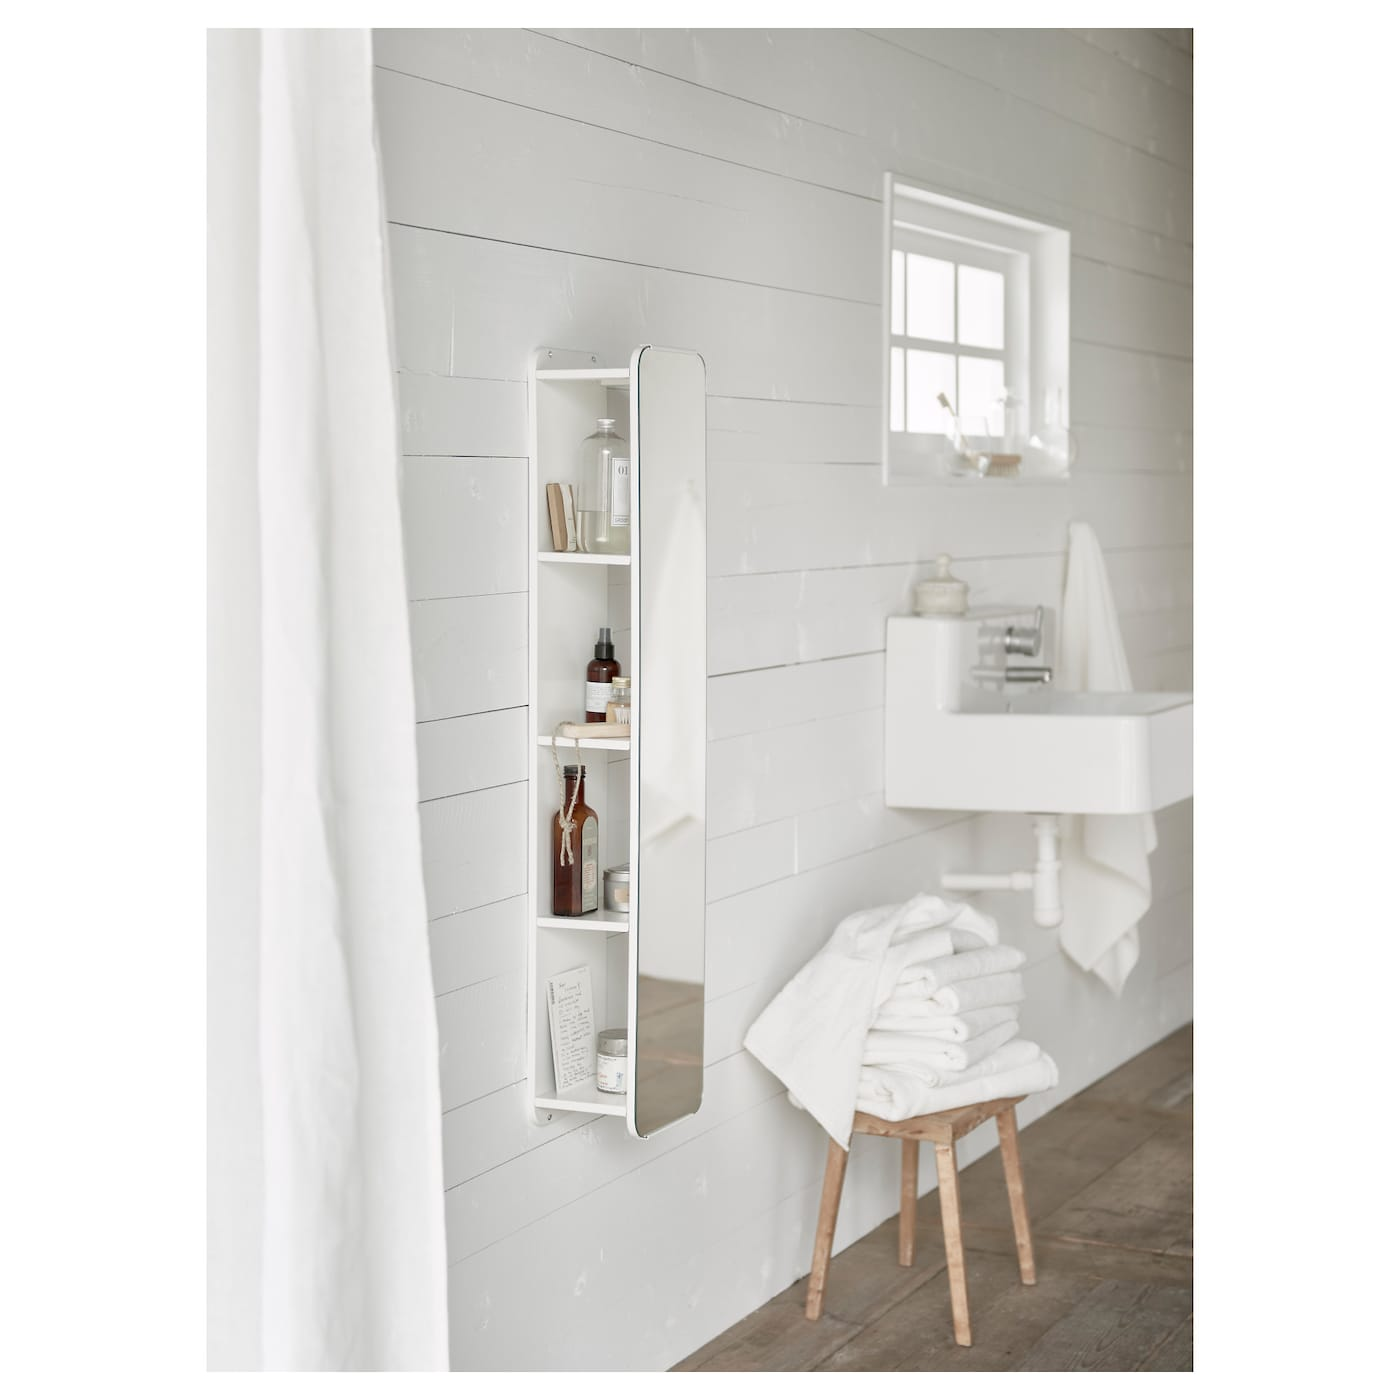 Ikea Bathroom Storage Unit: BRICKAN Mirror With Storage Unit White 20x100 Cm